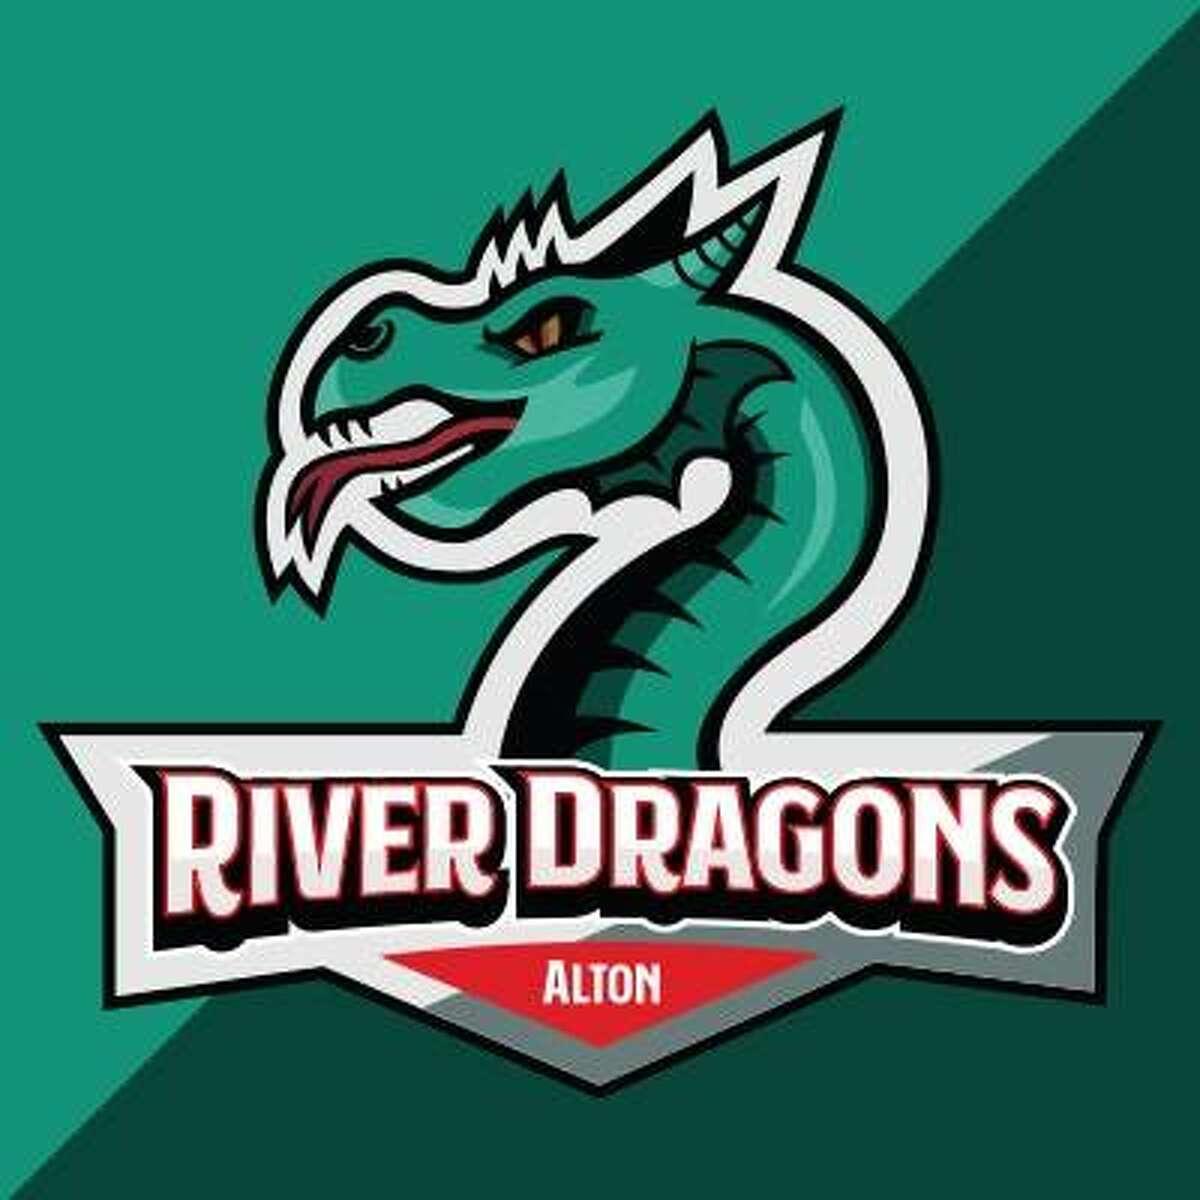 Alton River Dragons take on Quincy at 4:35 p.m. Sunday at Lloyd Hopkins Field, 98 Arnold Palmer Road, Alton.